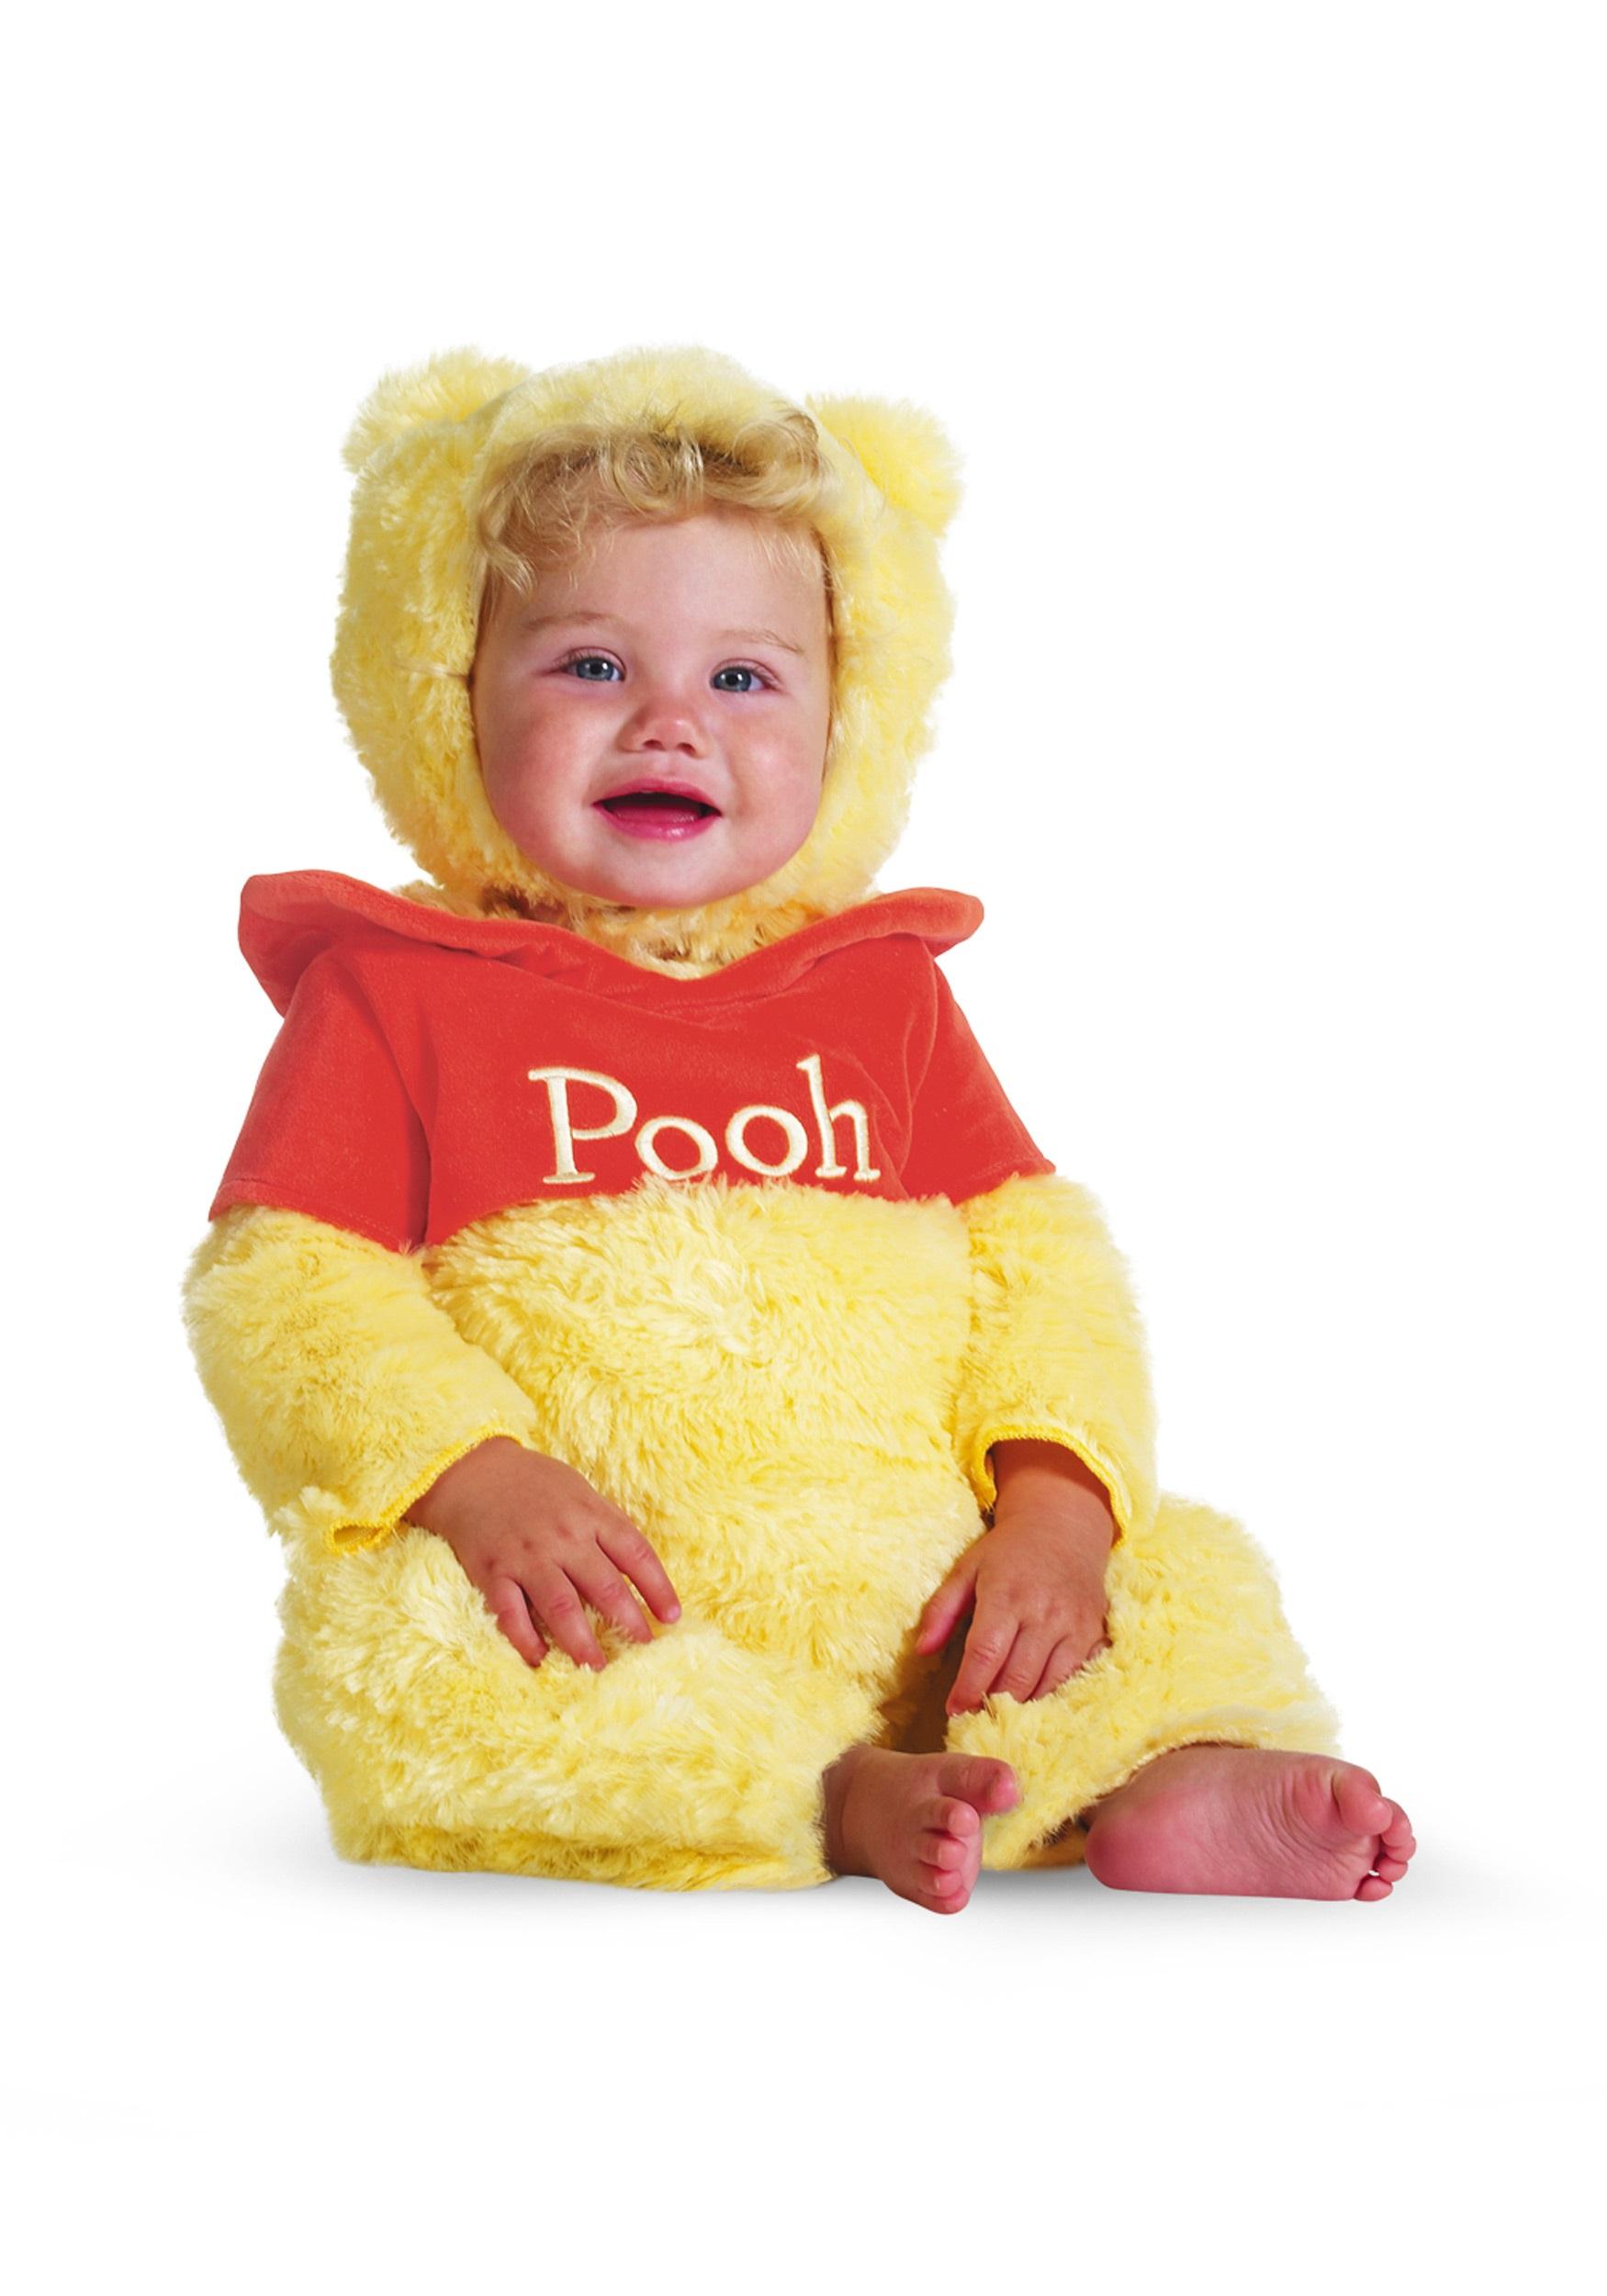 Assorted Prestige Infant Winnie Pooh Costume Prestige Infant Winnie Pooh Costume Halloween Costumes Baby Winnie Pooh Stickers Baby Winnie Pooh Costume baby Baby Winnie The Pooh